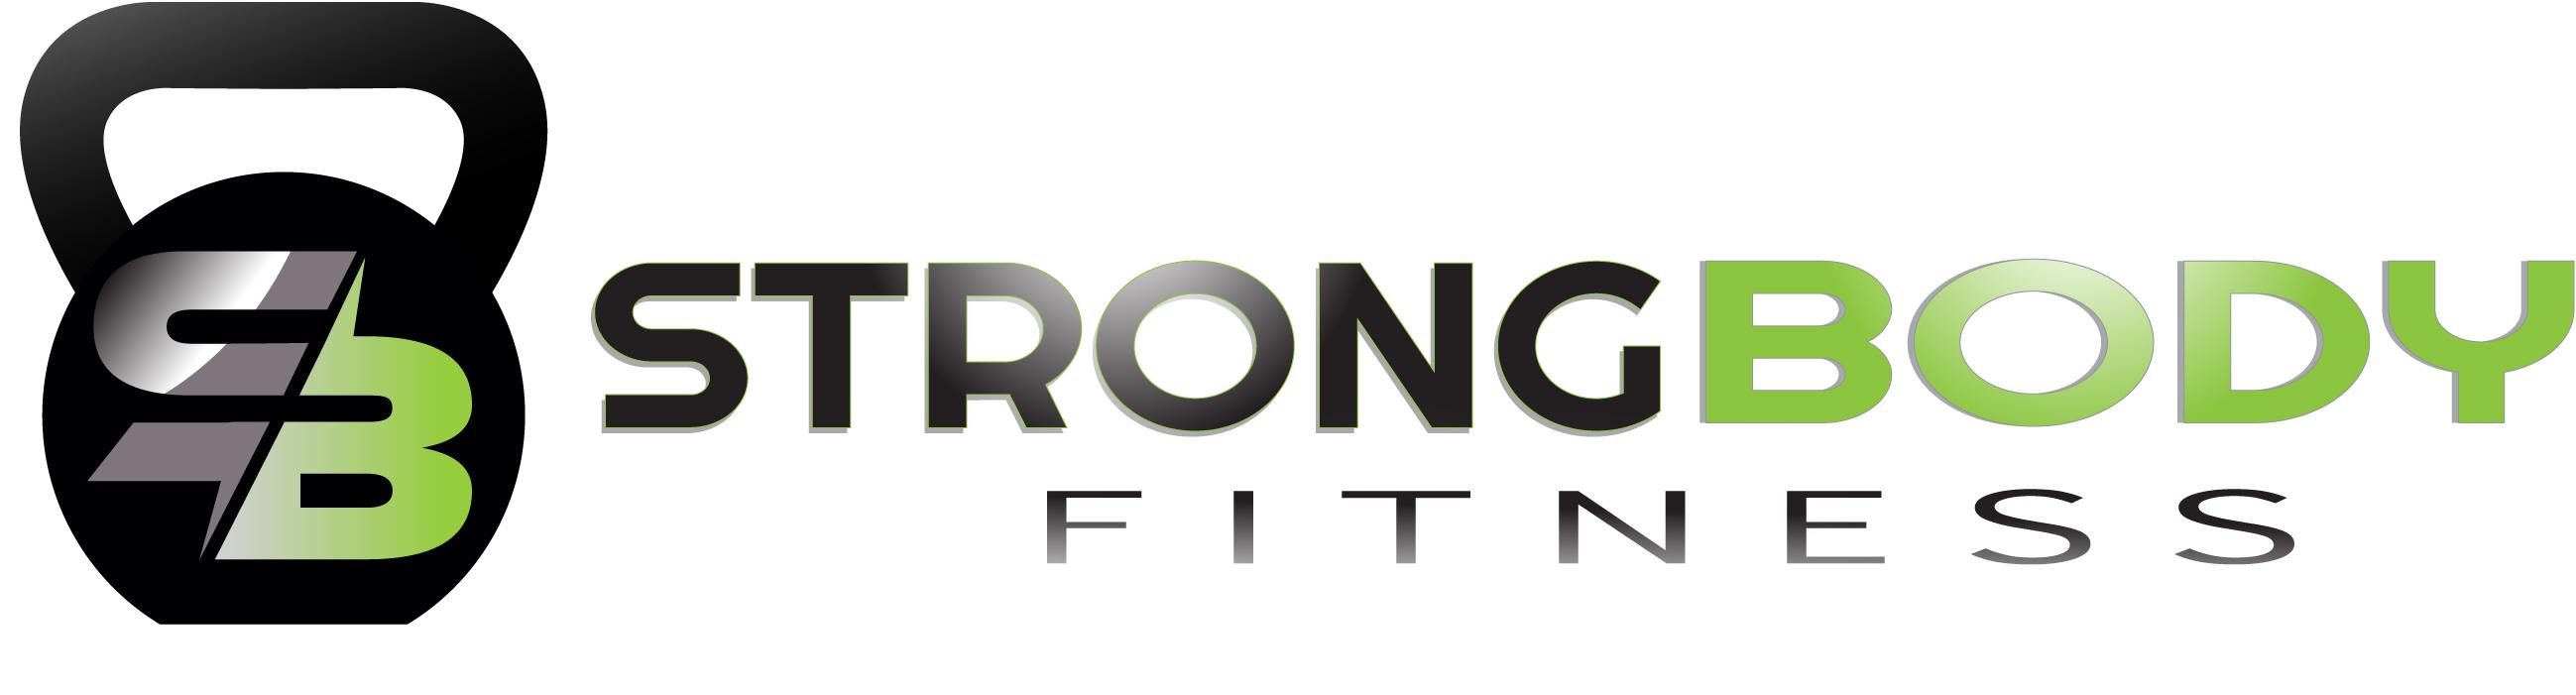 StrongBody Fitness logo